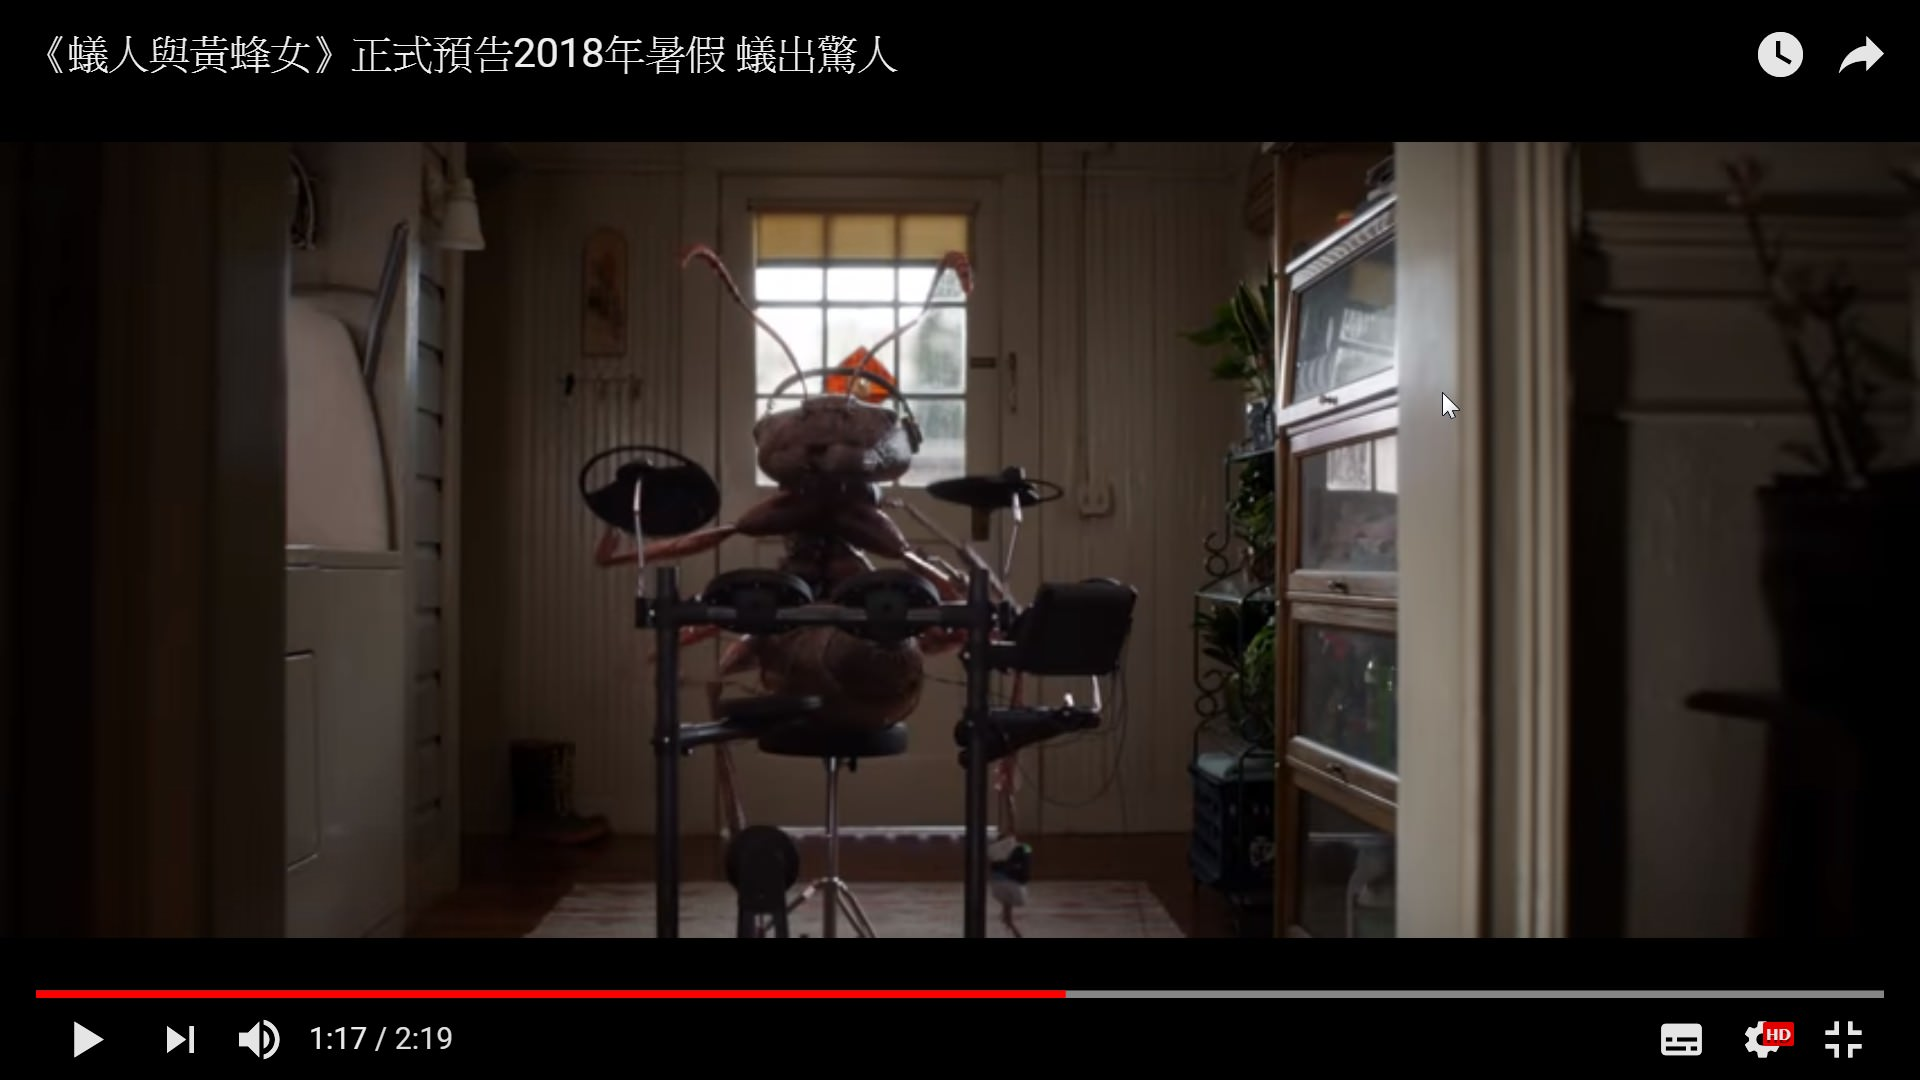 Movie, Ant-Man and the Wasp(美國.英國) / 蟻人與黃蜂女(台) / 蚁人2:黄蜂女现身(中) / 蟻俠2:黃蜂女現身(港), 電影預告